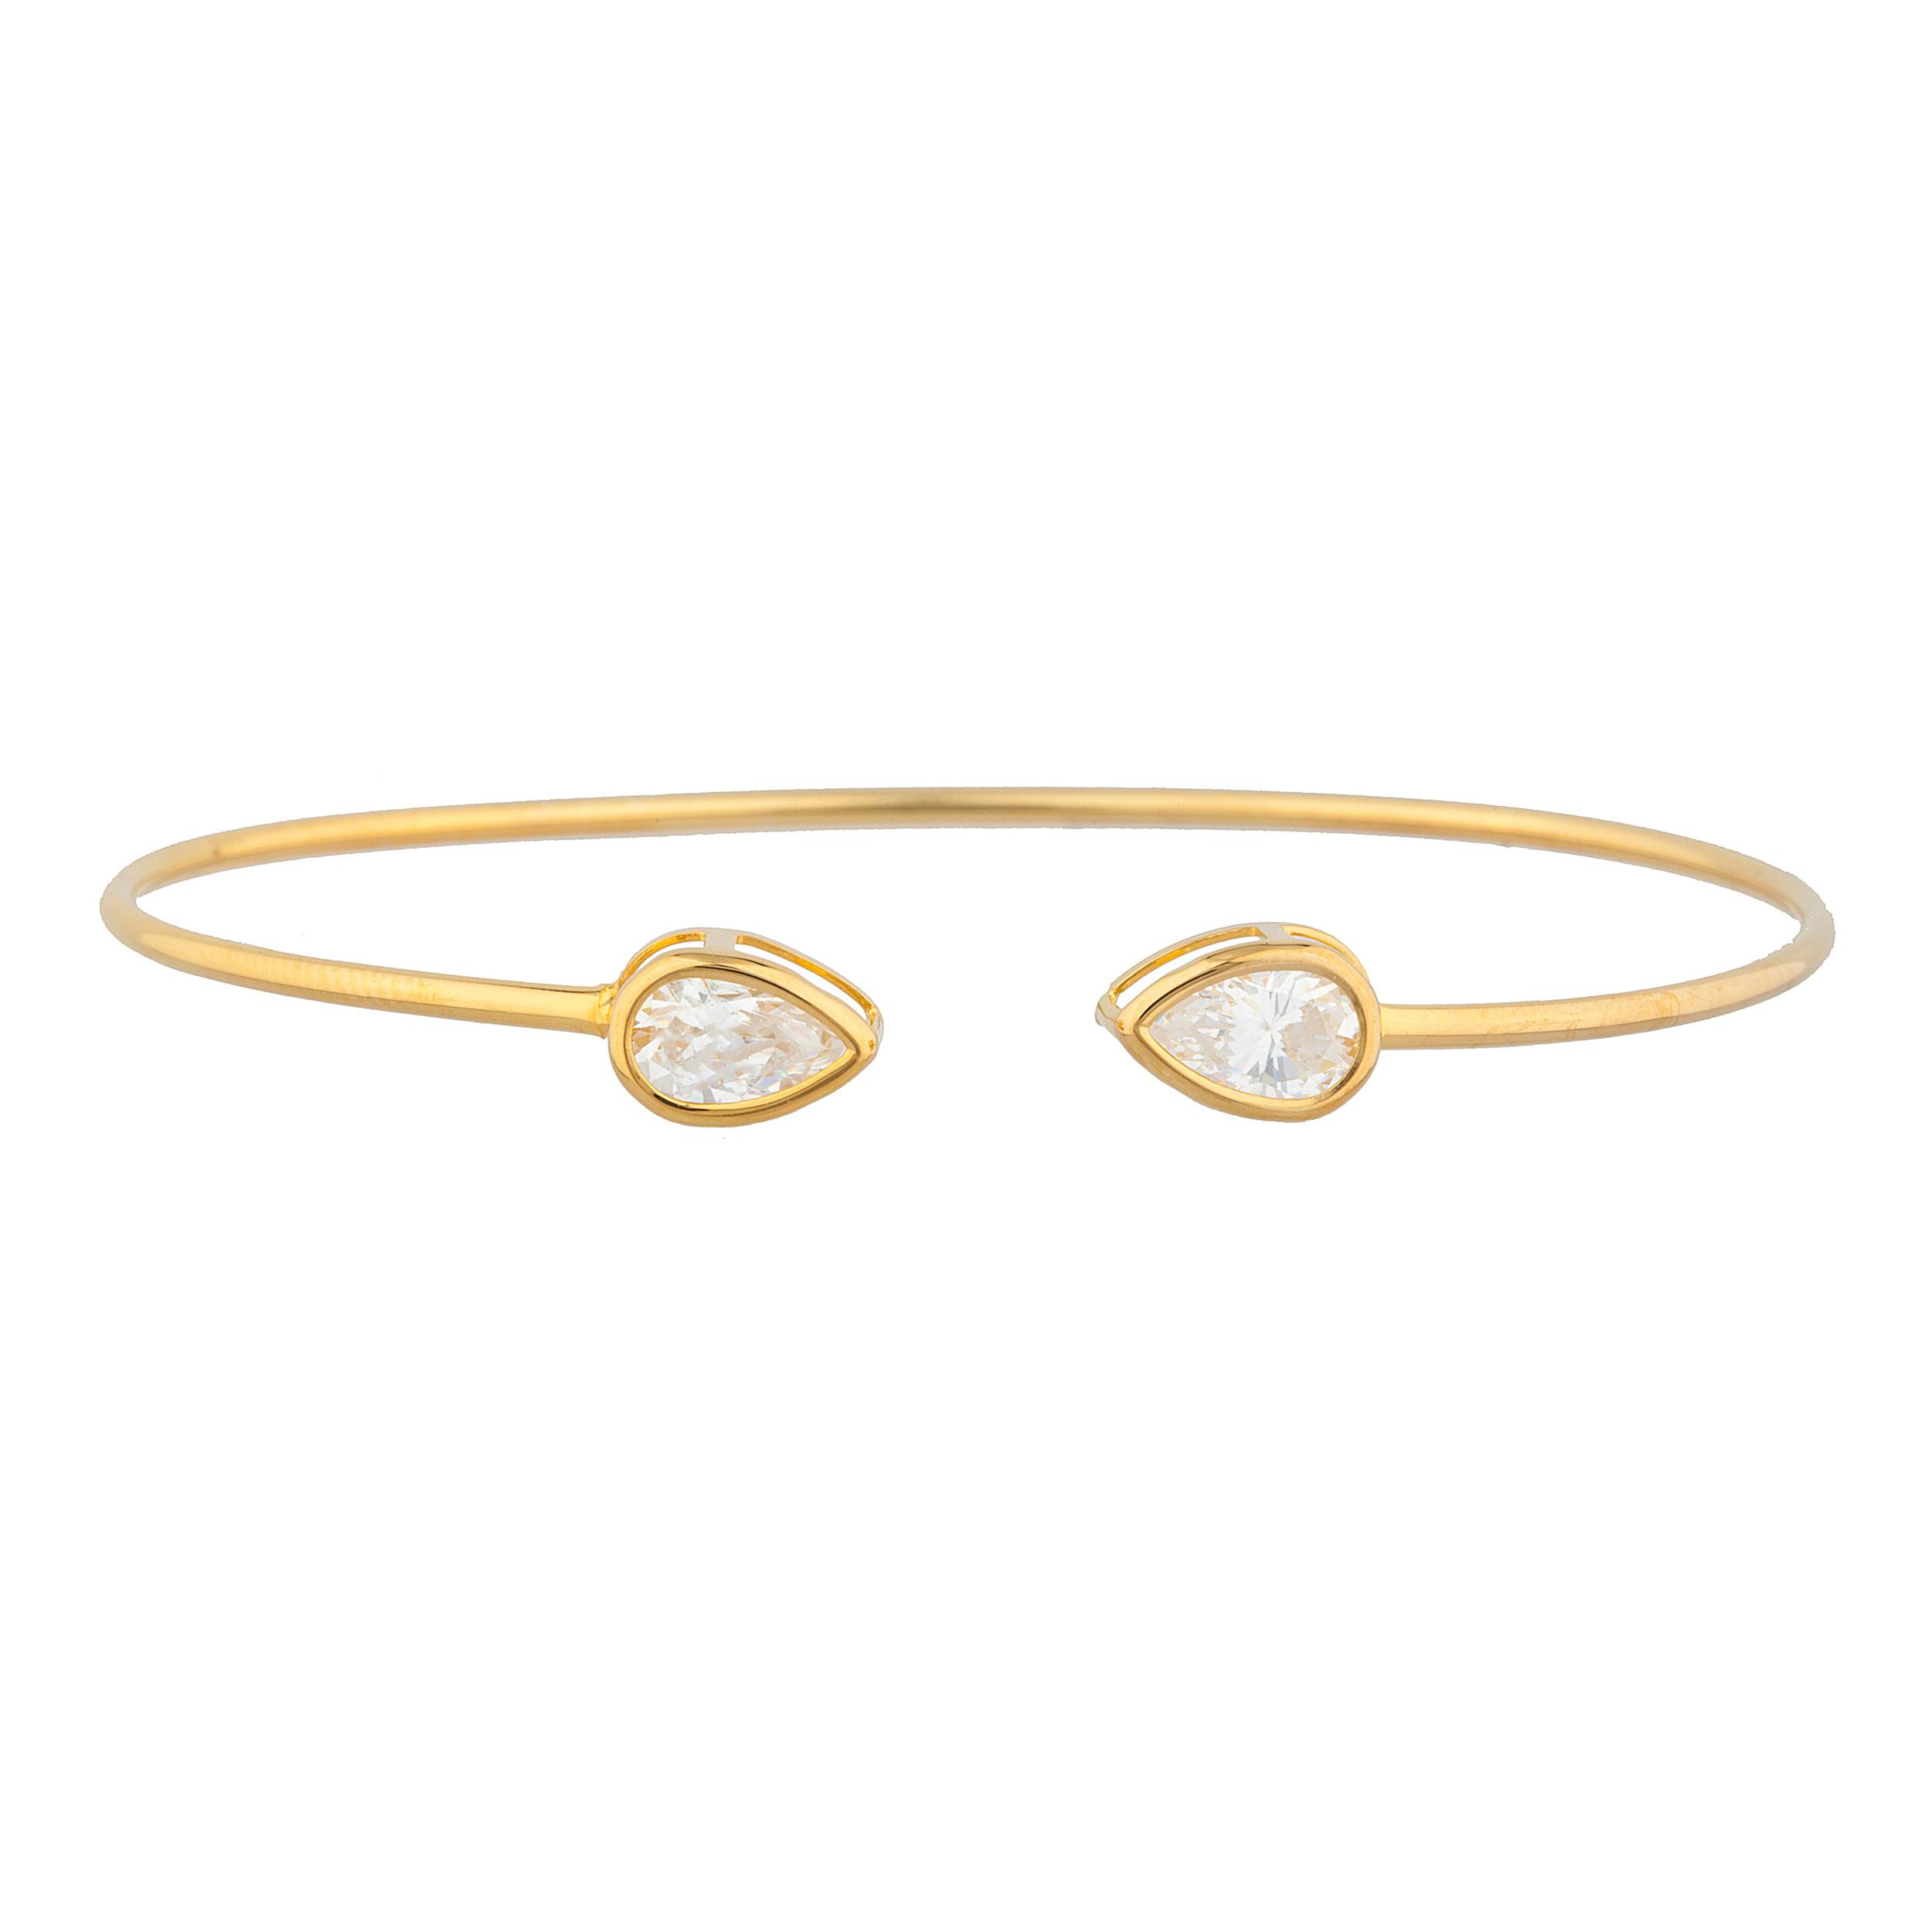 14Kt Yellow Gold Plated White Sapphire Pear Bezel Bangle Bracelet by Elizabeth Jewelry Inc